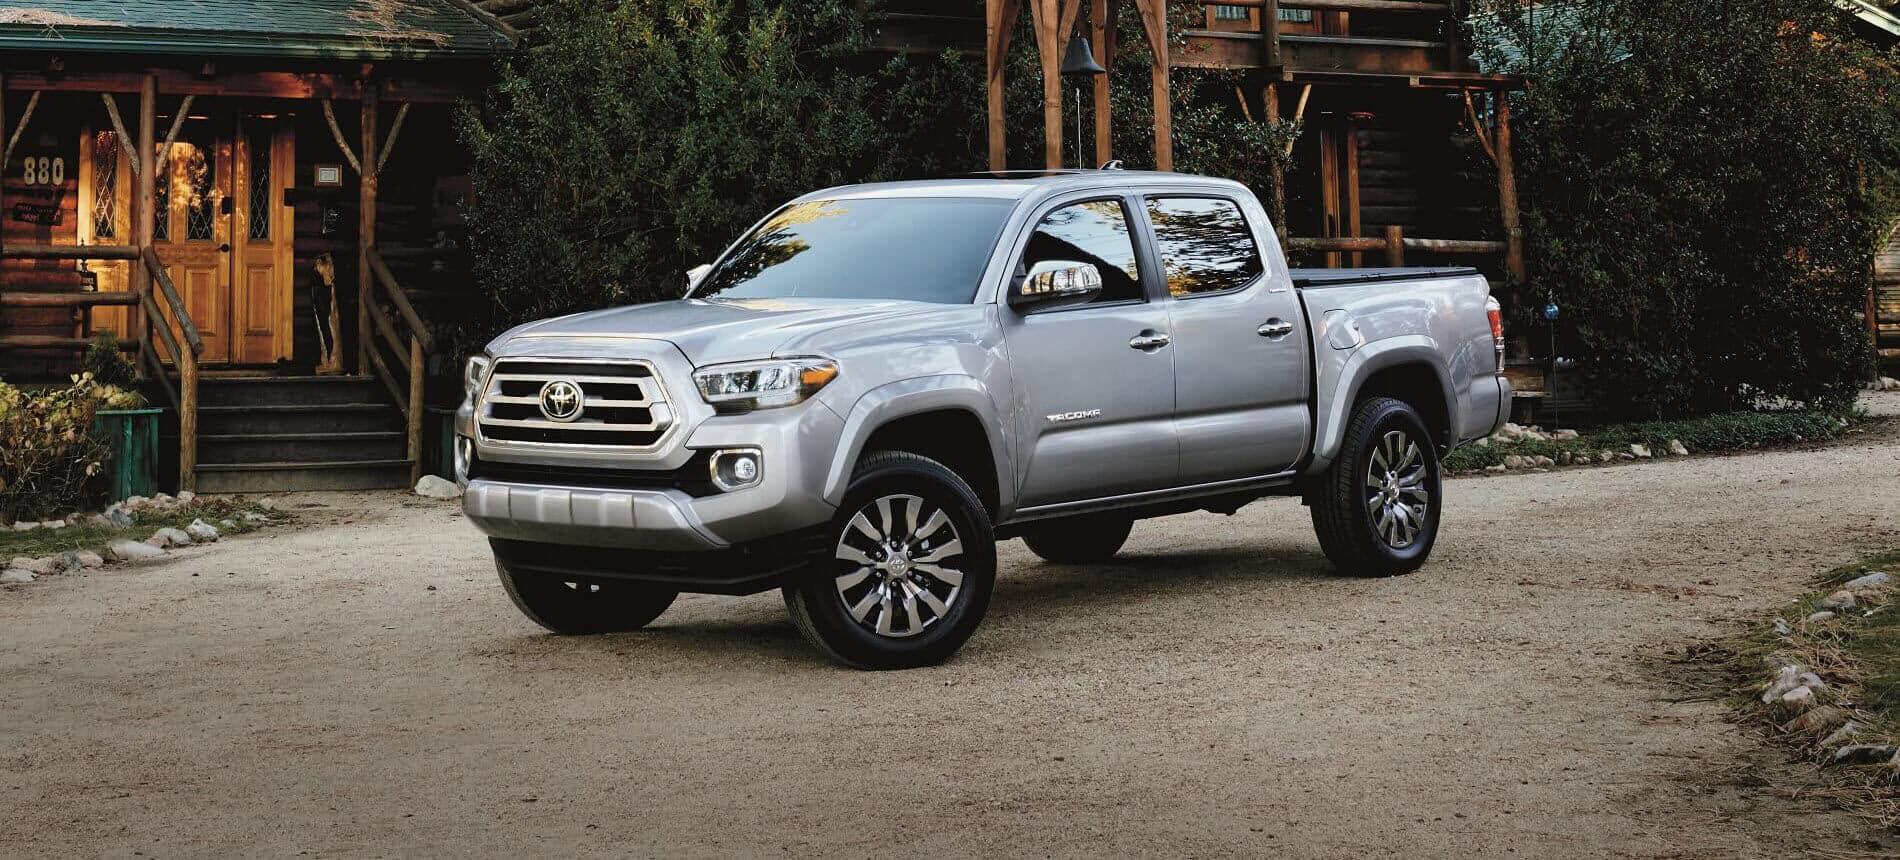 Toyota Tacoma Limited